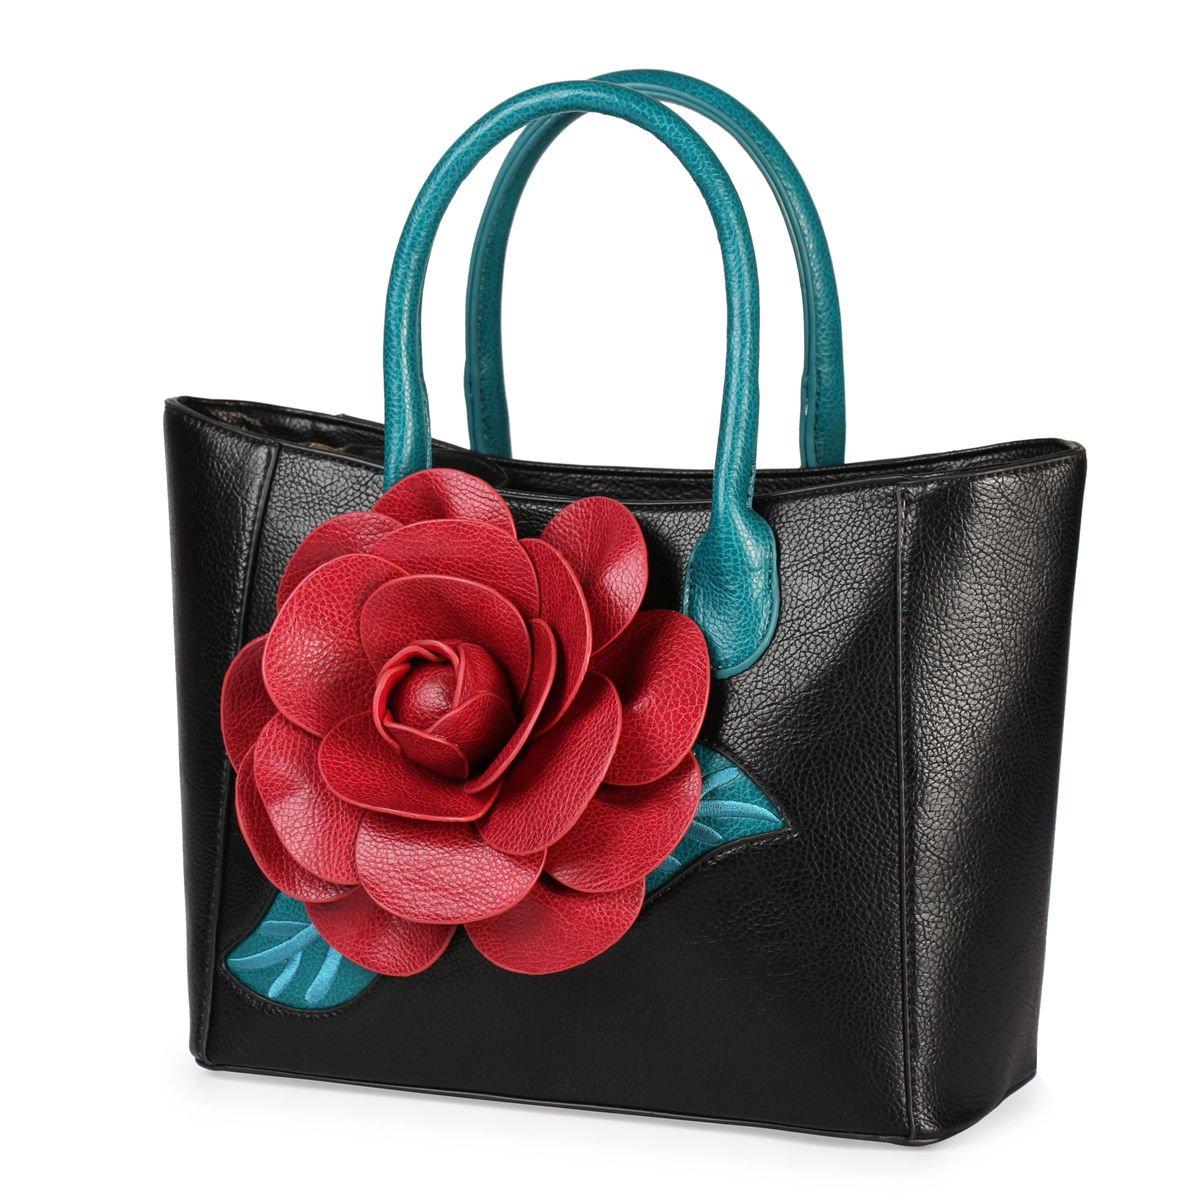 Women Handbag 3D Flower Seris PU Leather Purse Tote Bag By Vanillachocolate (Medium, Black)